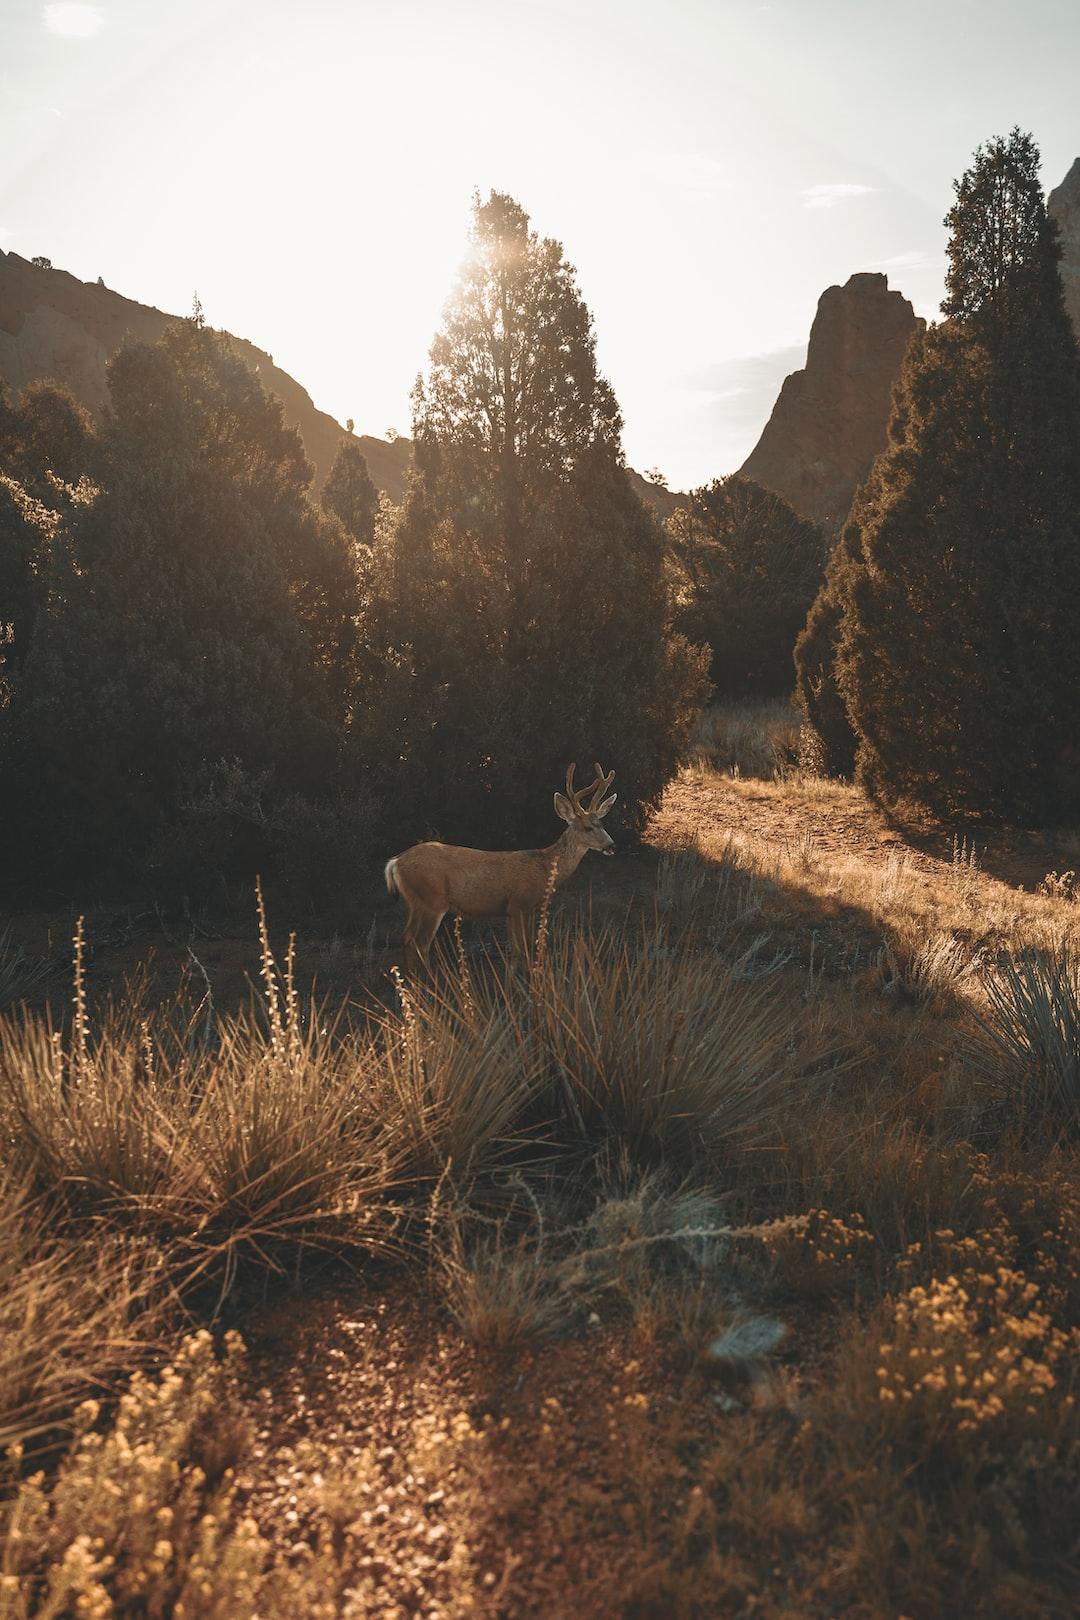 A wild deer boi chillin in Colorado